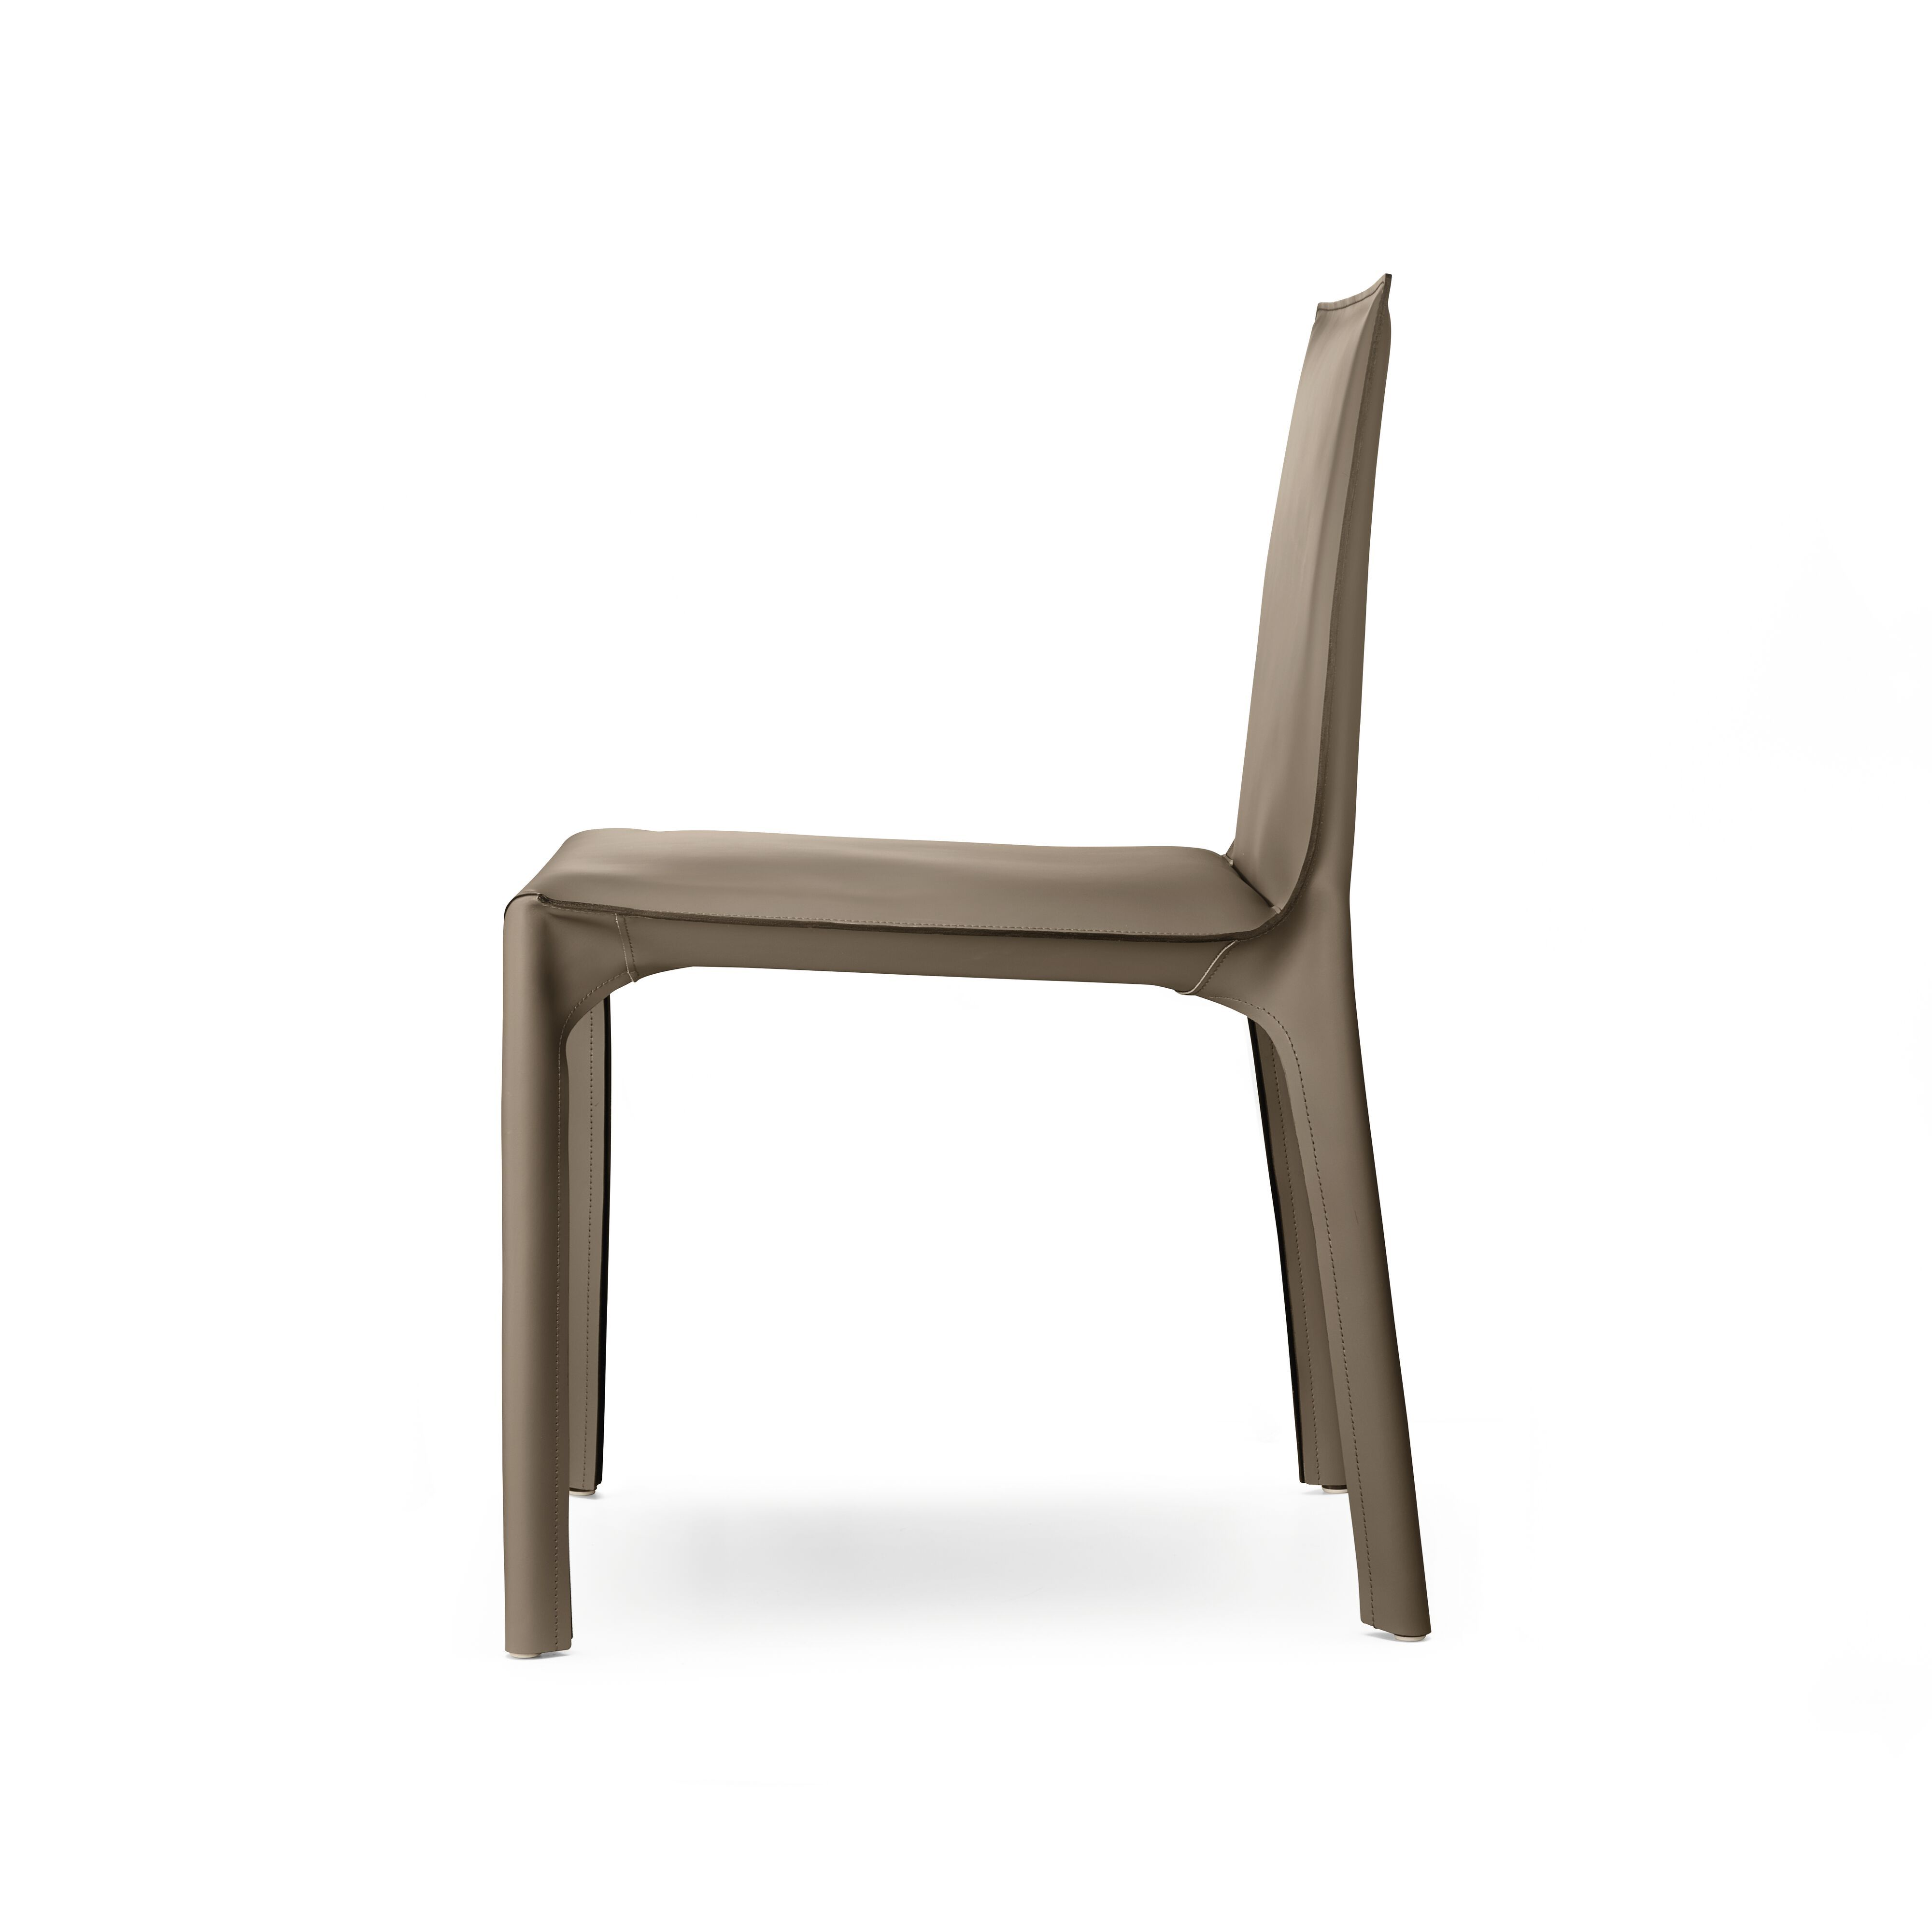 02-WK-Saddle-Chair-0008.tif